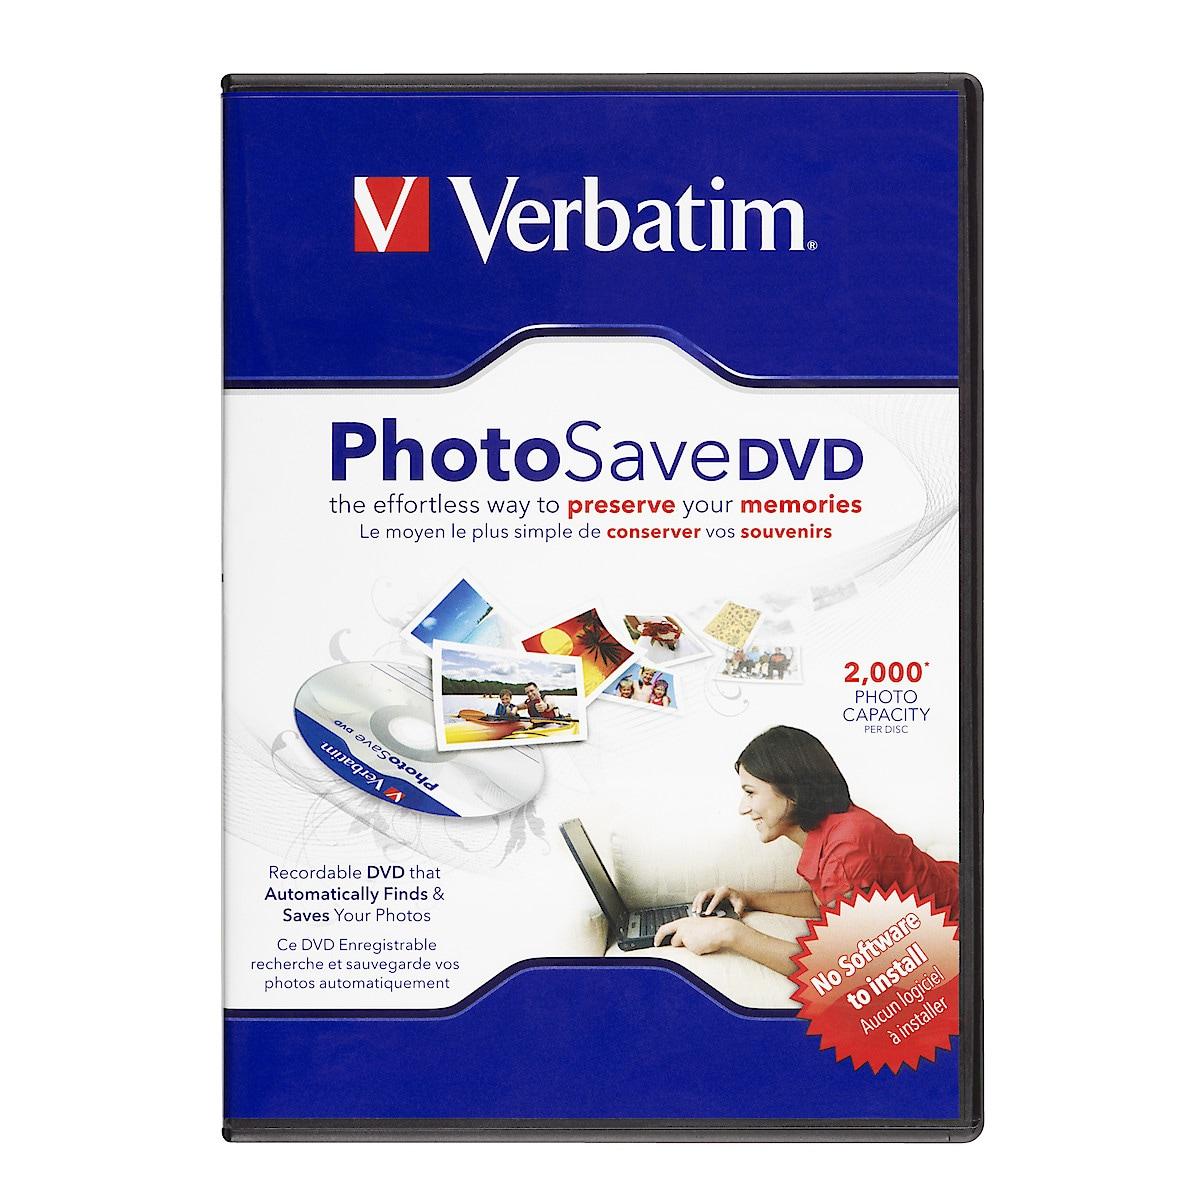 Verbatim Photo Save DVD